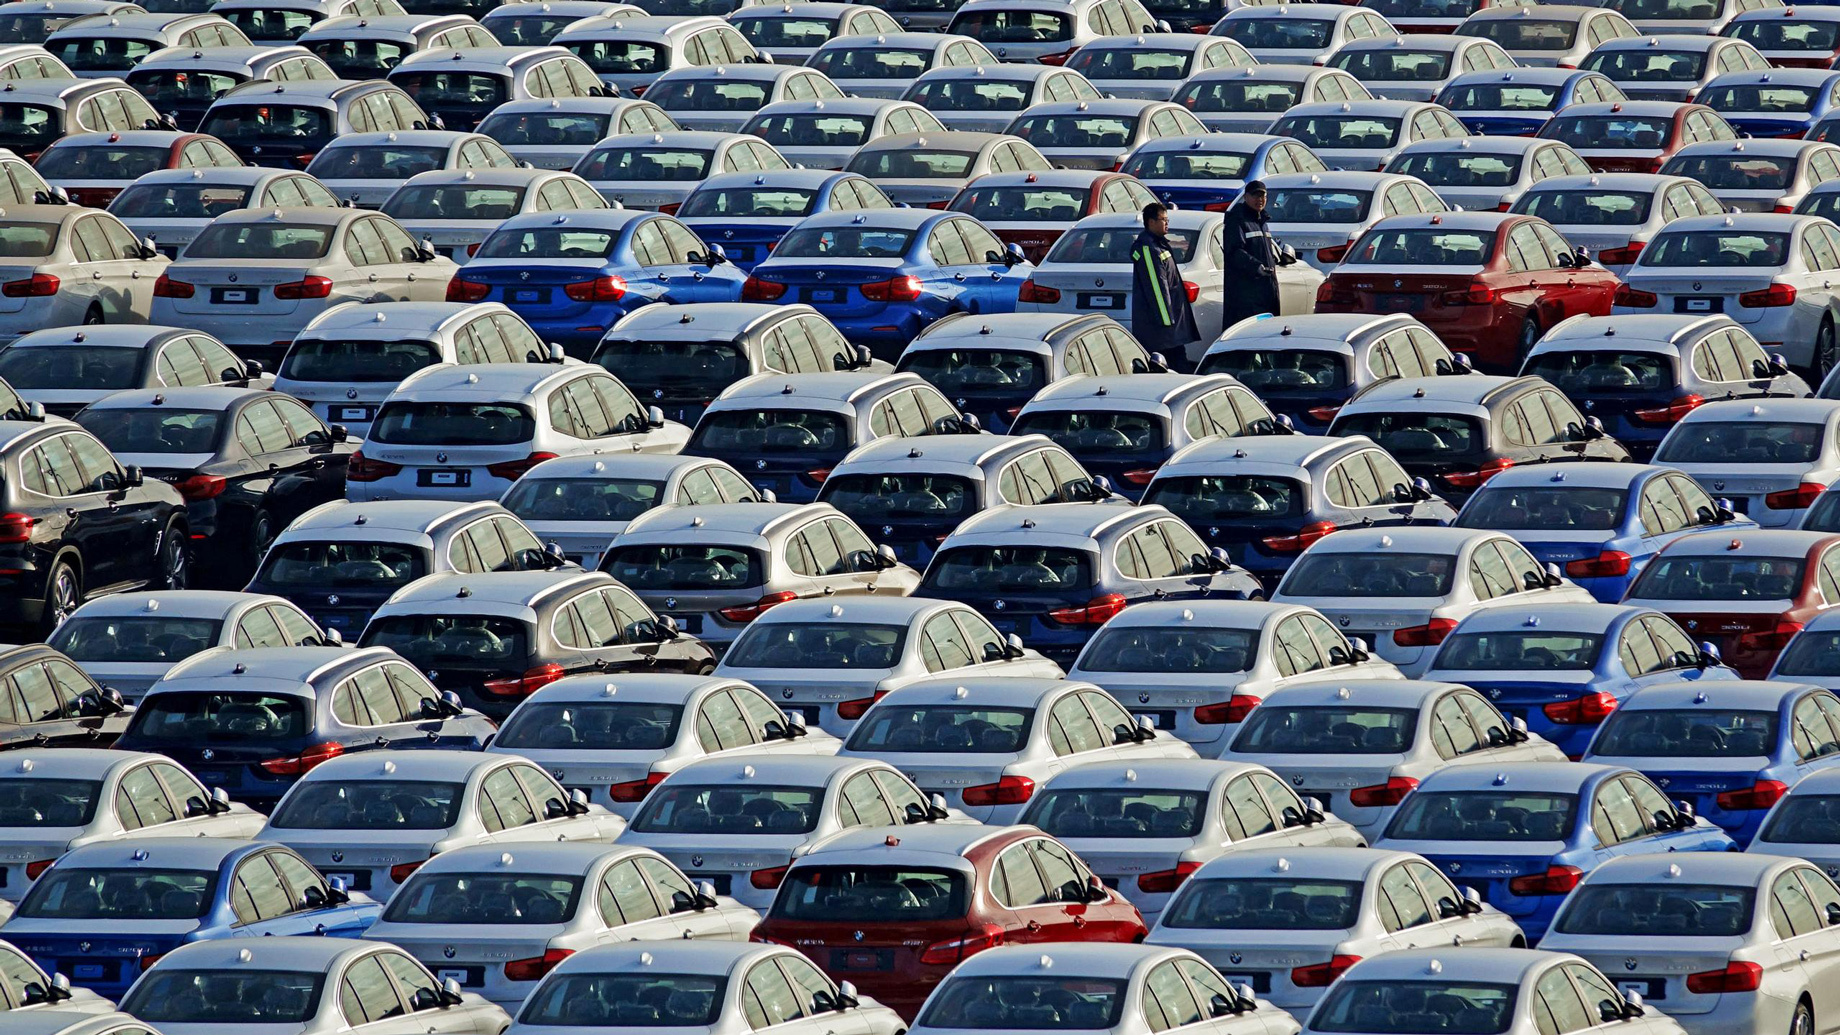 Европейские автозаводы прекратят производство из-за вируса